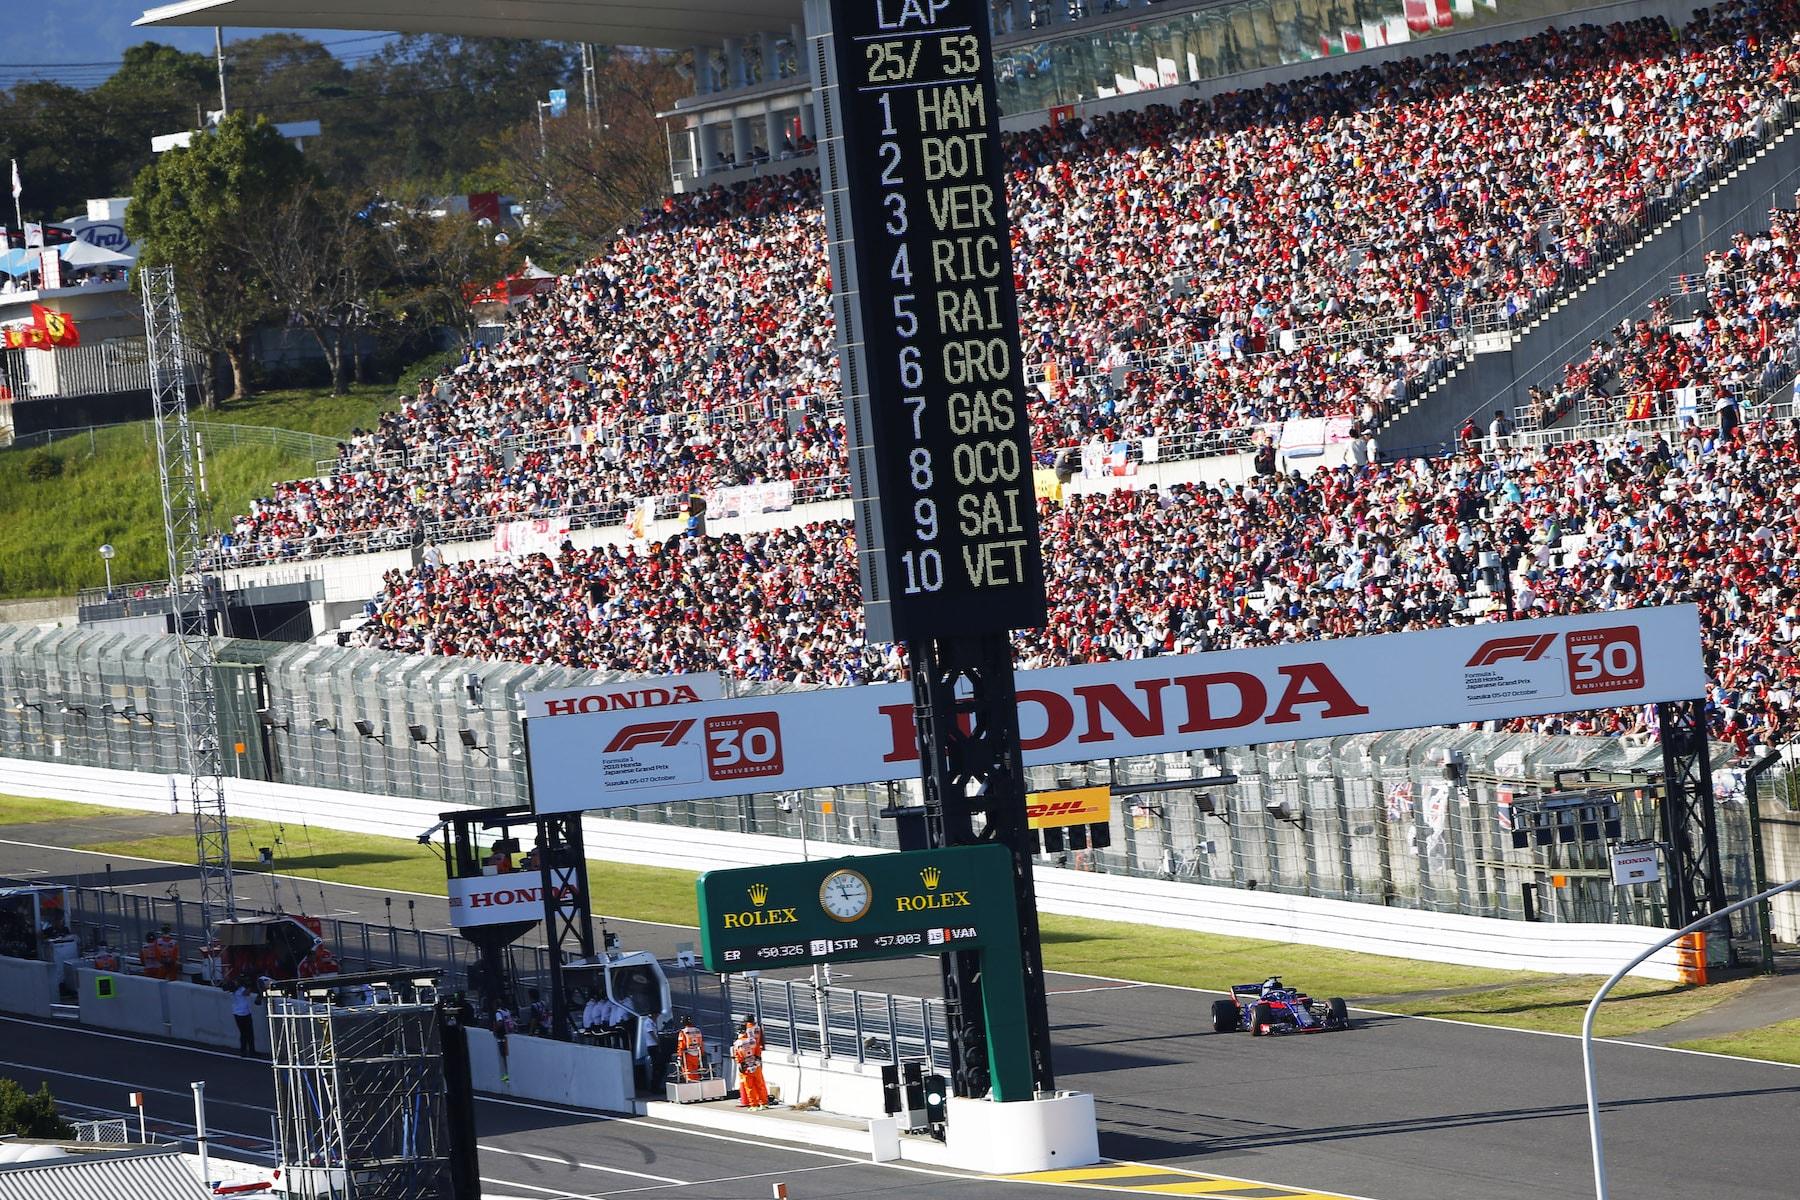 G 2018 Brendon Hartley | Toro Rosso STR13 | 2018 Japanese GP 1 copy.jpg